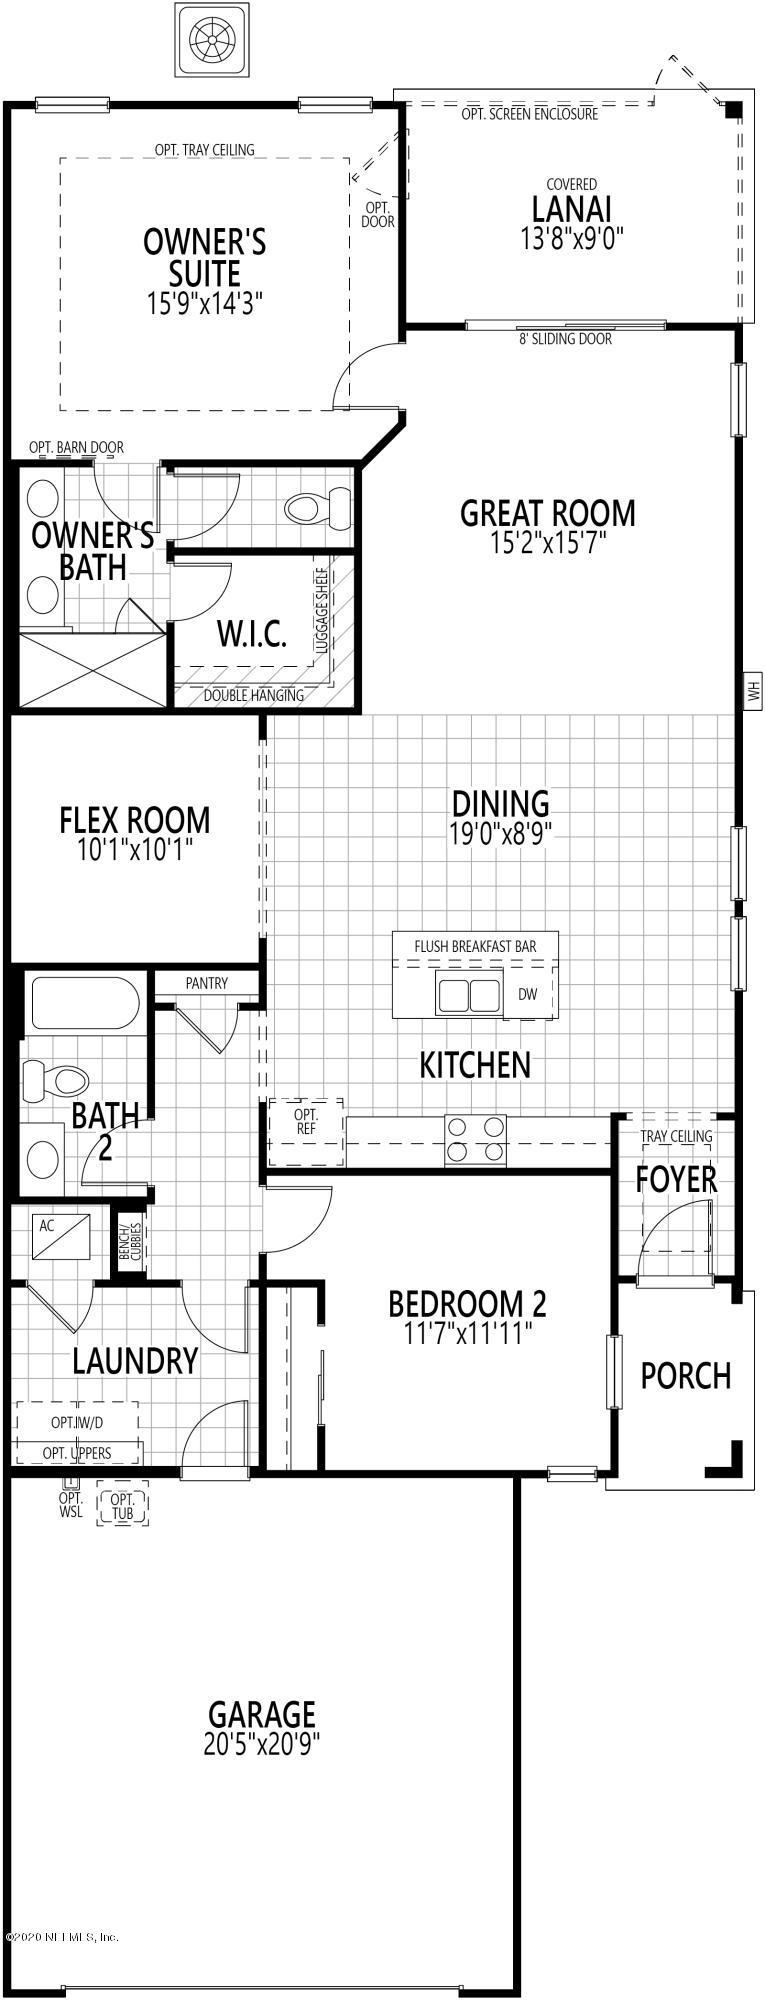 182 JUNIPER HILLS, ST JOHNS, FLORIDA 32259, 2 Bedrooms Bedrooms, ,2 BathroomsBathrooms,Residential,For sale,JUNIPER HILLS,1040747